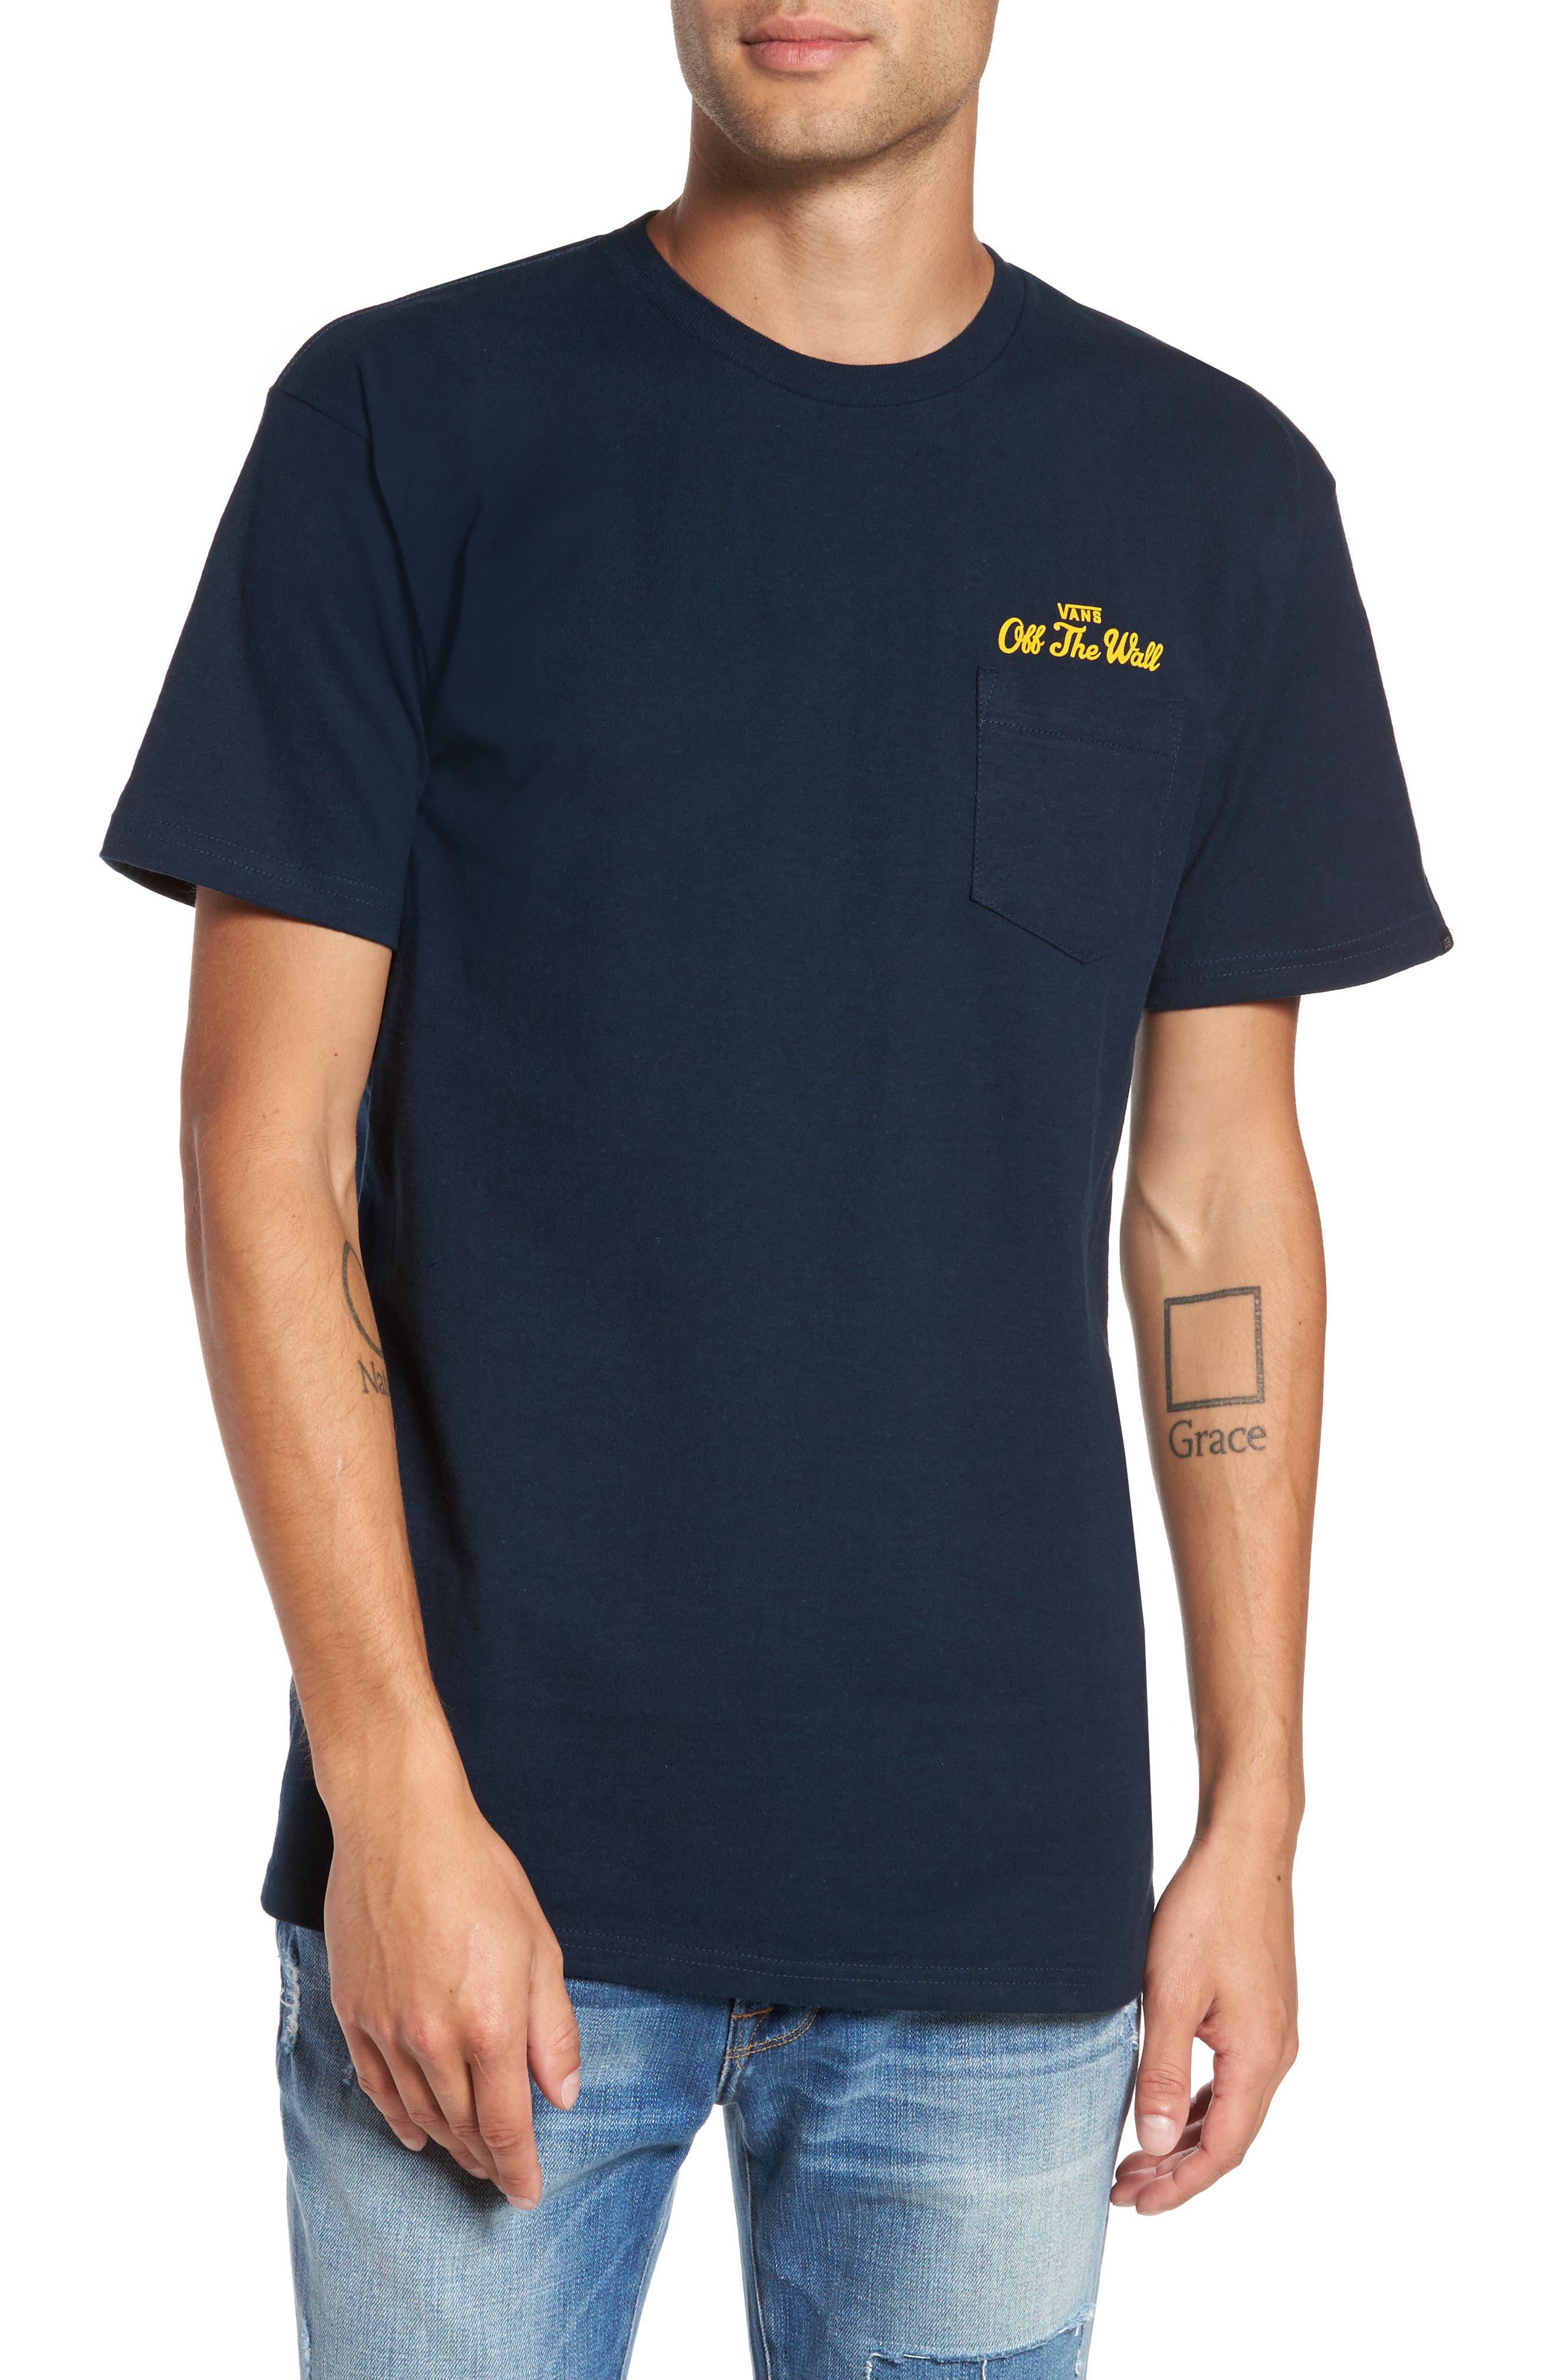 Vans Original Logo Graphic Pocket T-Shirt